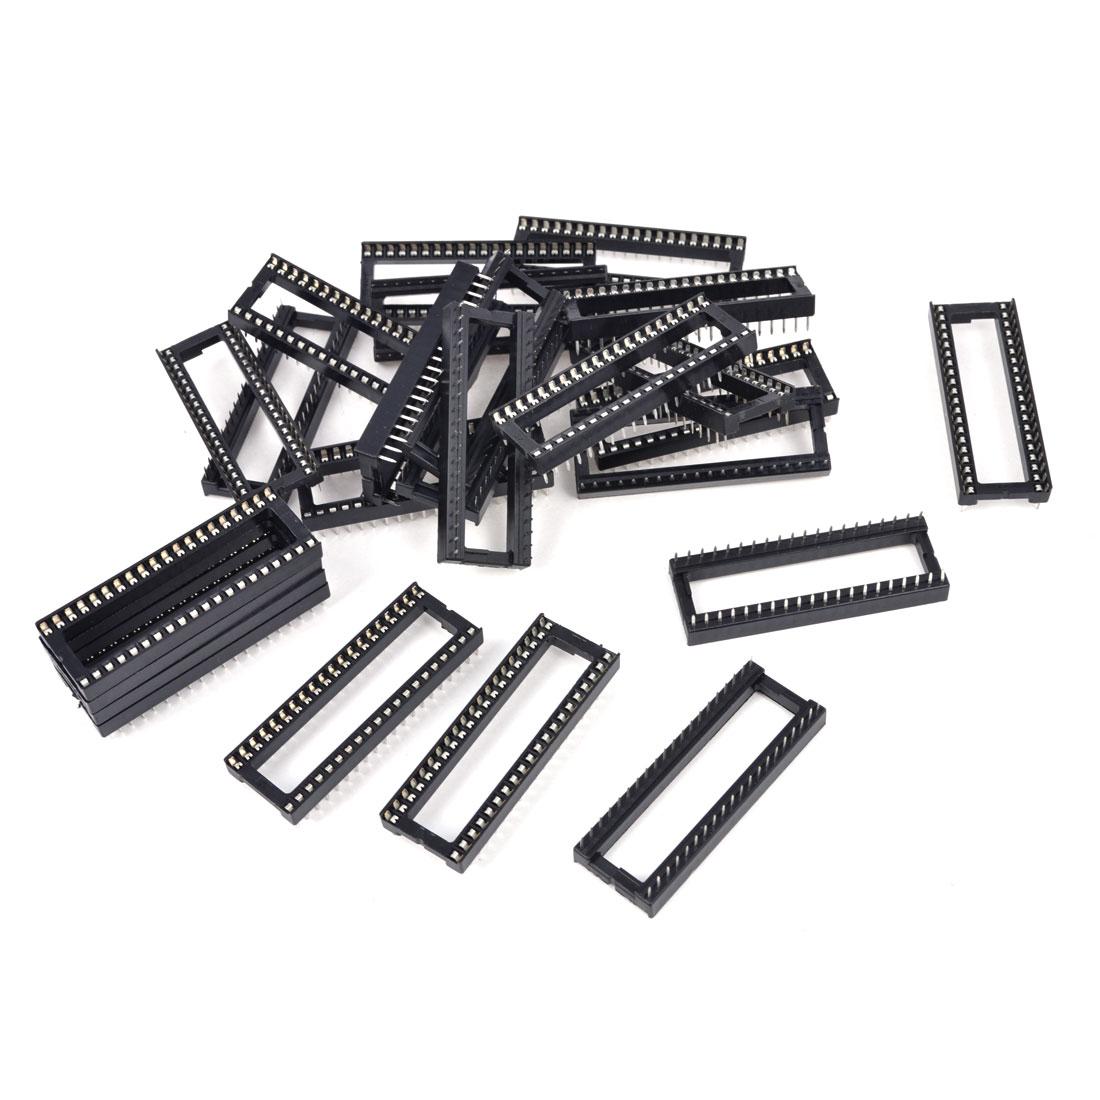 25 Pcs 2.54mm PCB Board 2 Row 40-Pin DIP Solder Type IC Socket Adapter